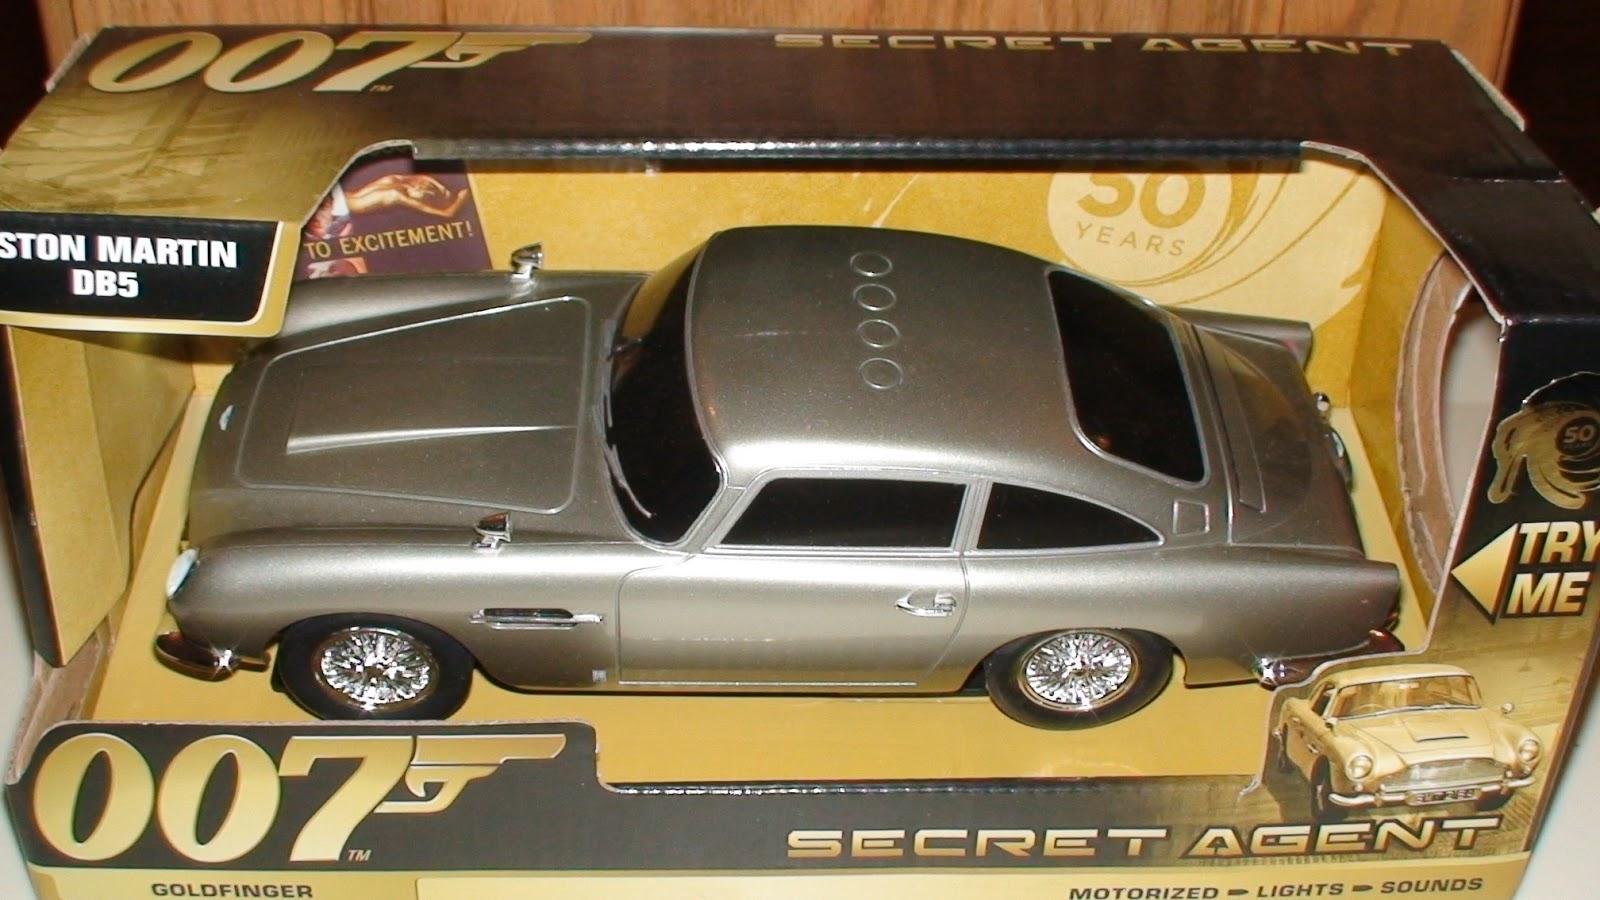 007, James Bond, Secret Agent vehicle, Toystate, holiday gifts